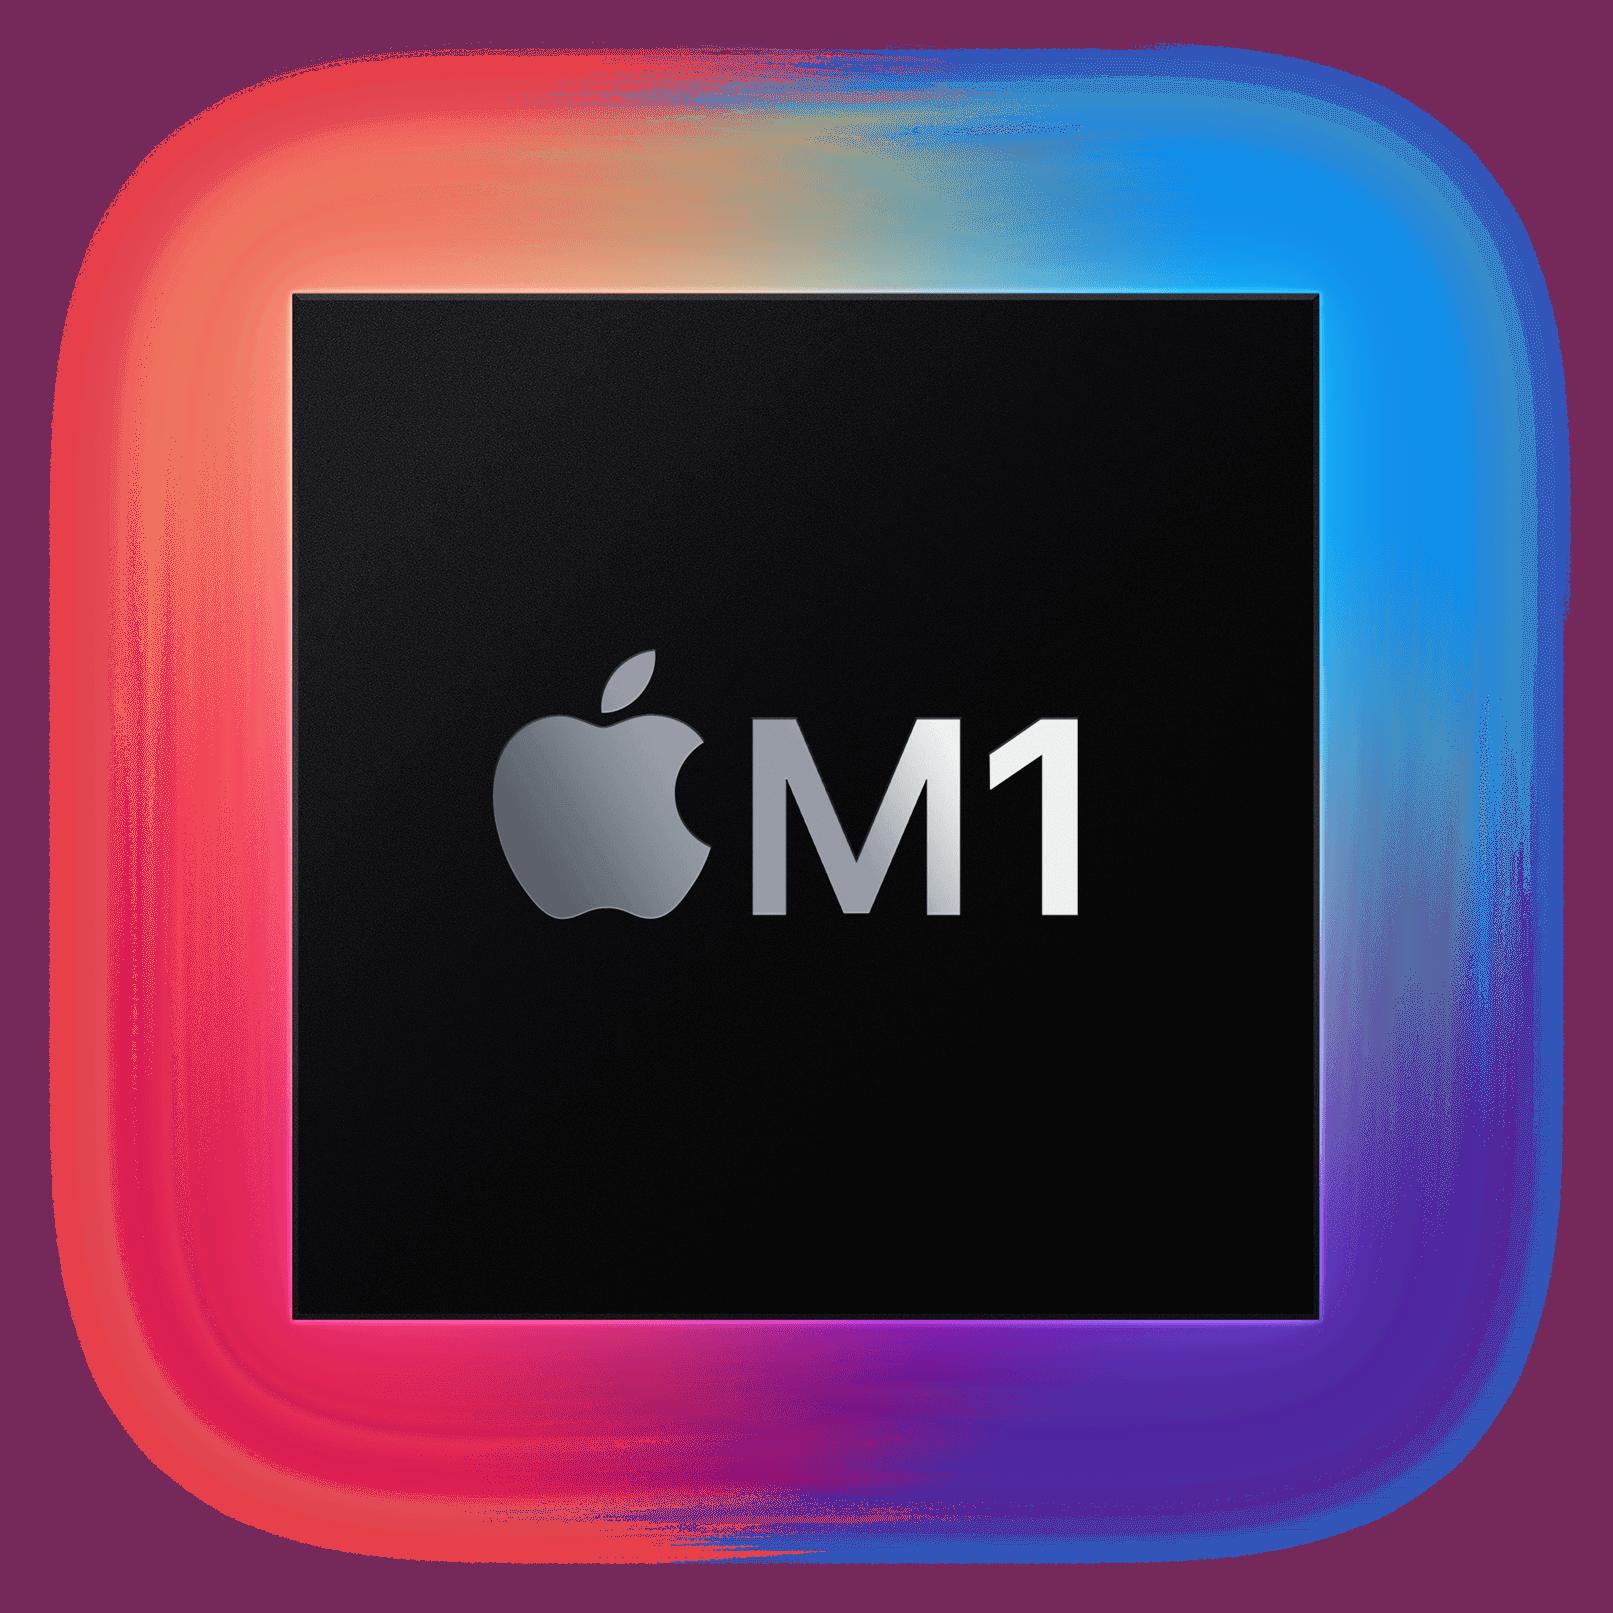 m1 chip large